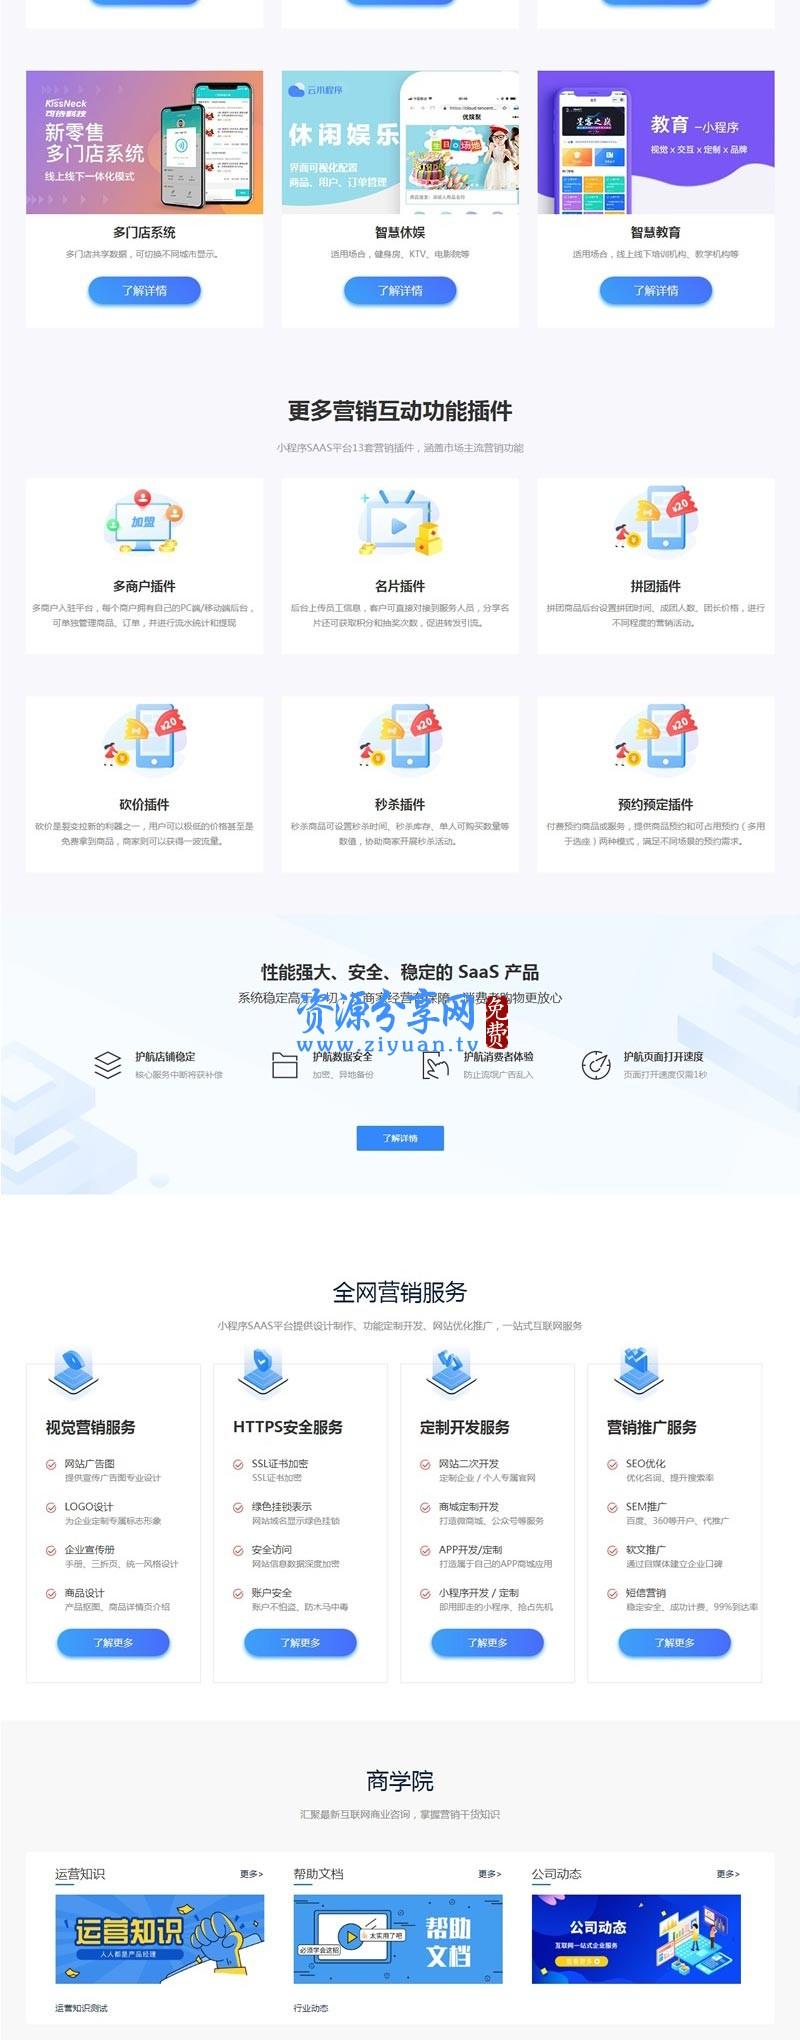 PbootCms 微信小程序官网模版 企业官网社交电商官网 网络工作室软件公司官网